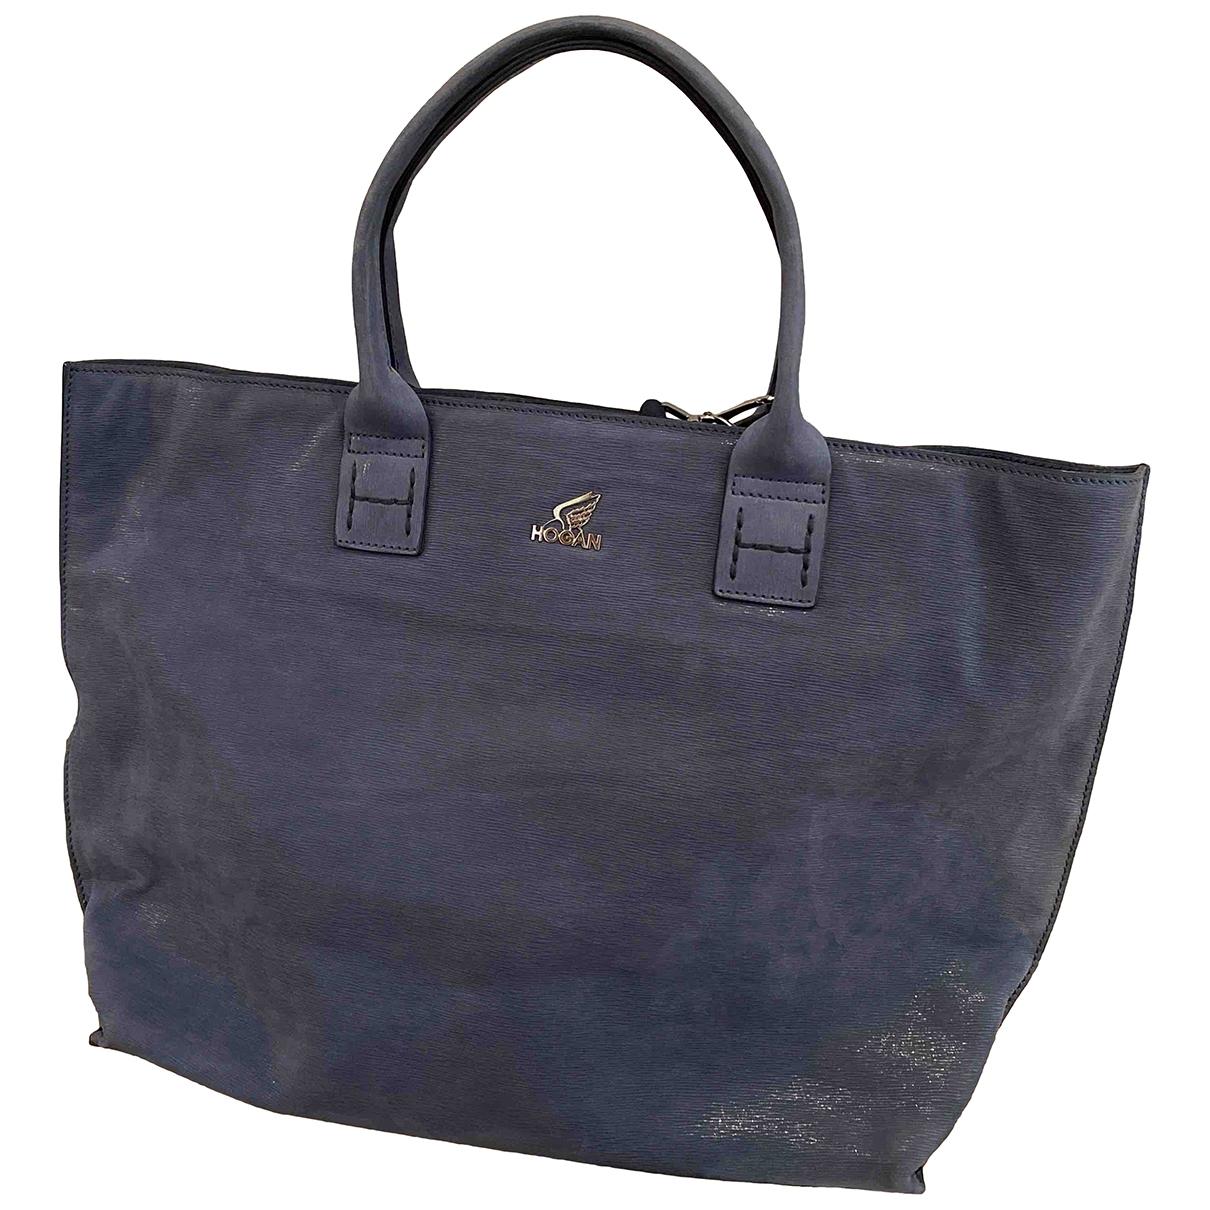 Hogan \N Handtasche in  Blau Veloursleder